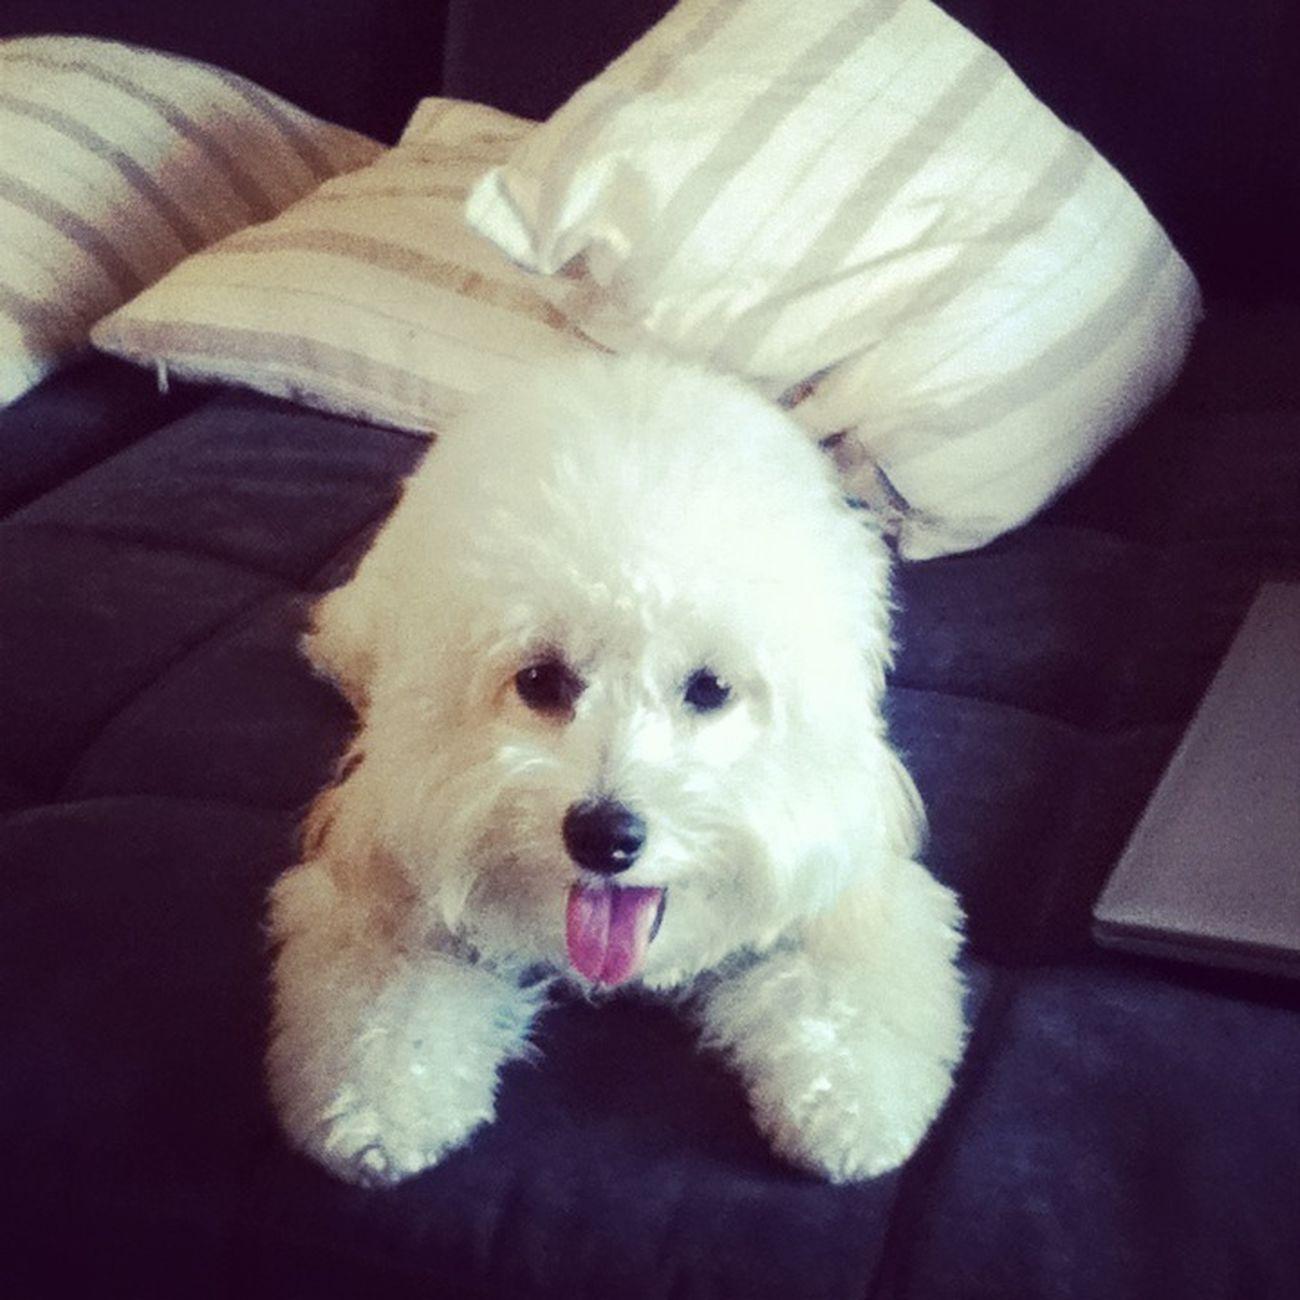 ma babe Pets DogLove Cute Pets Puppy